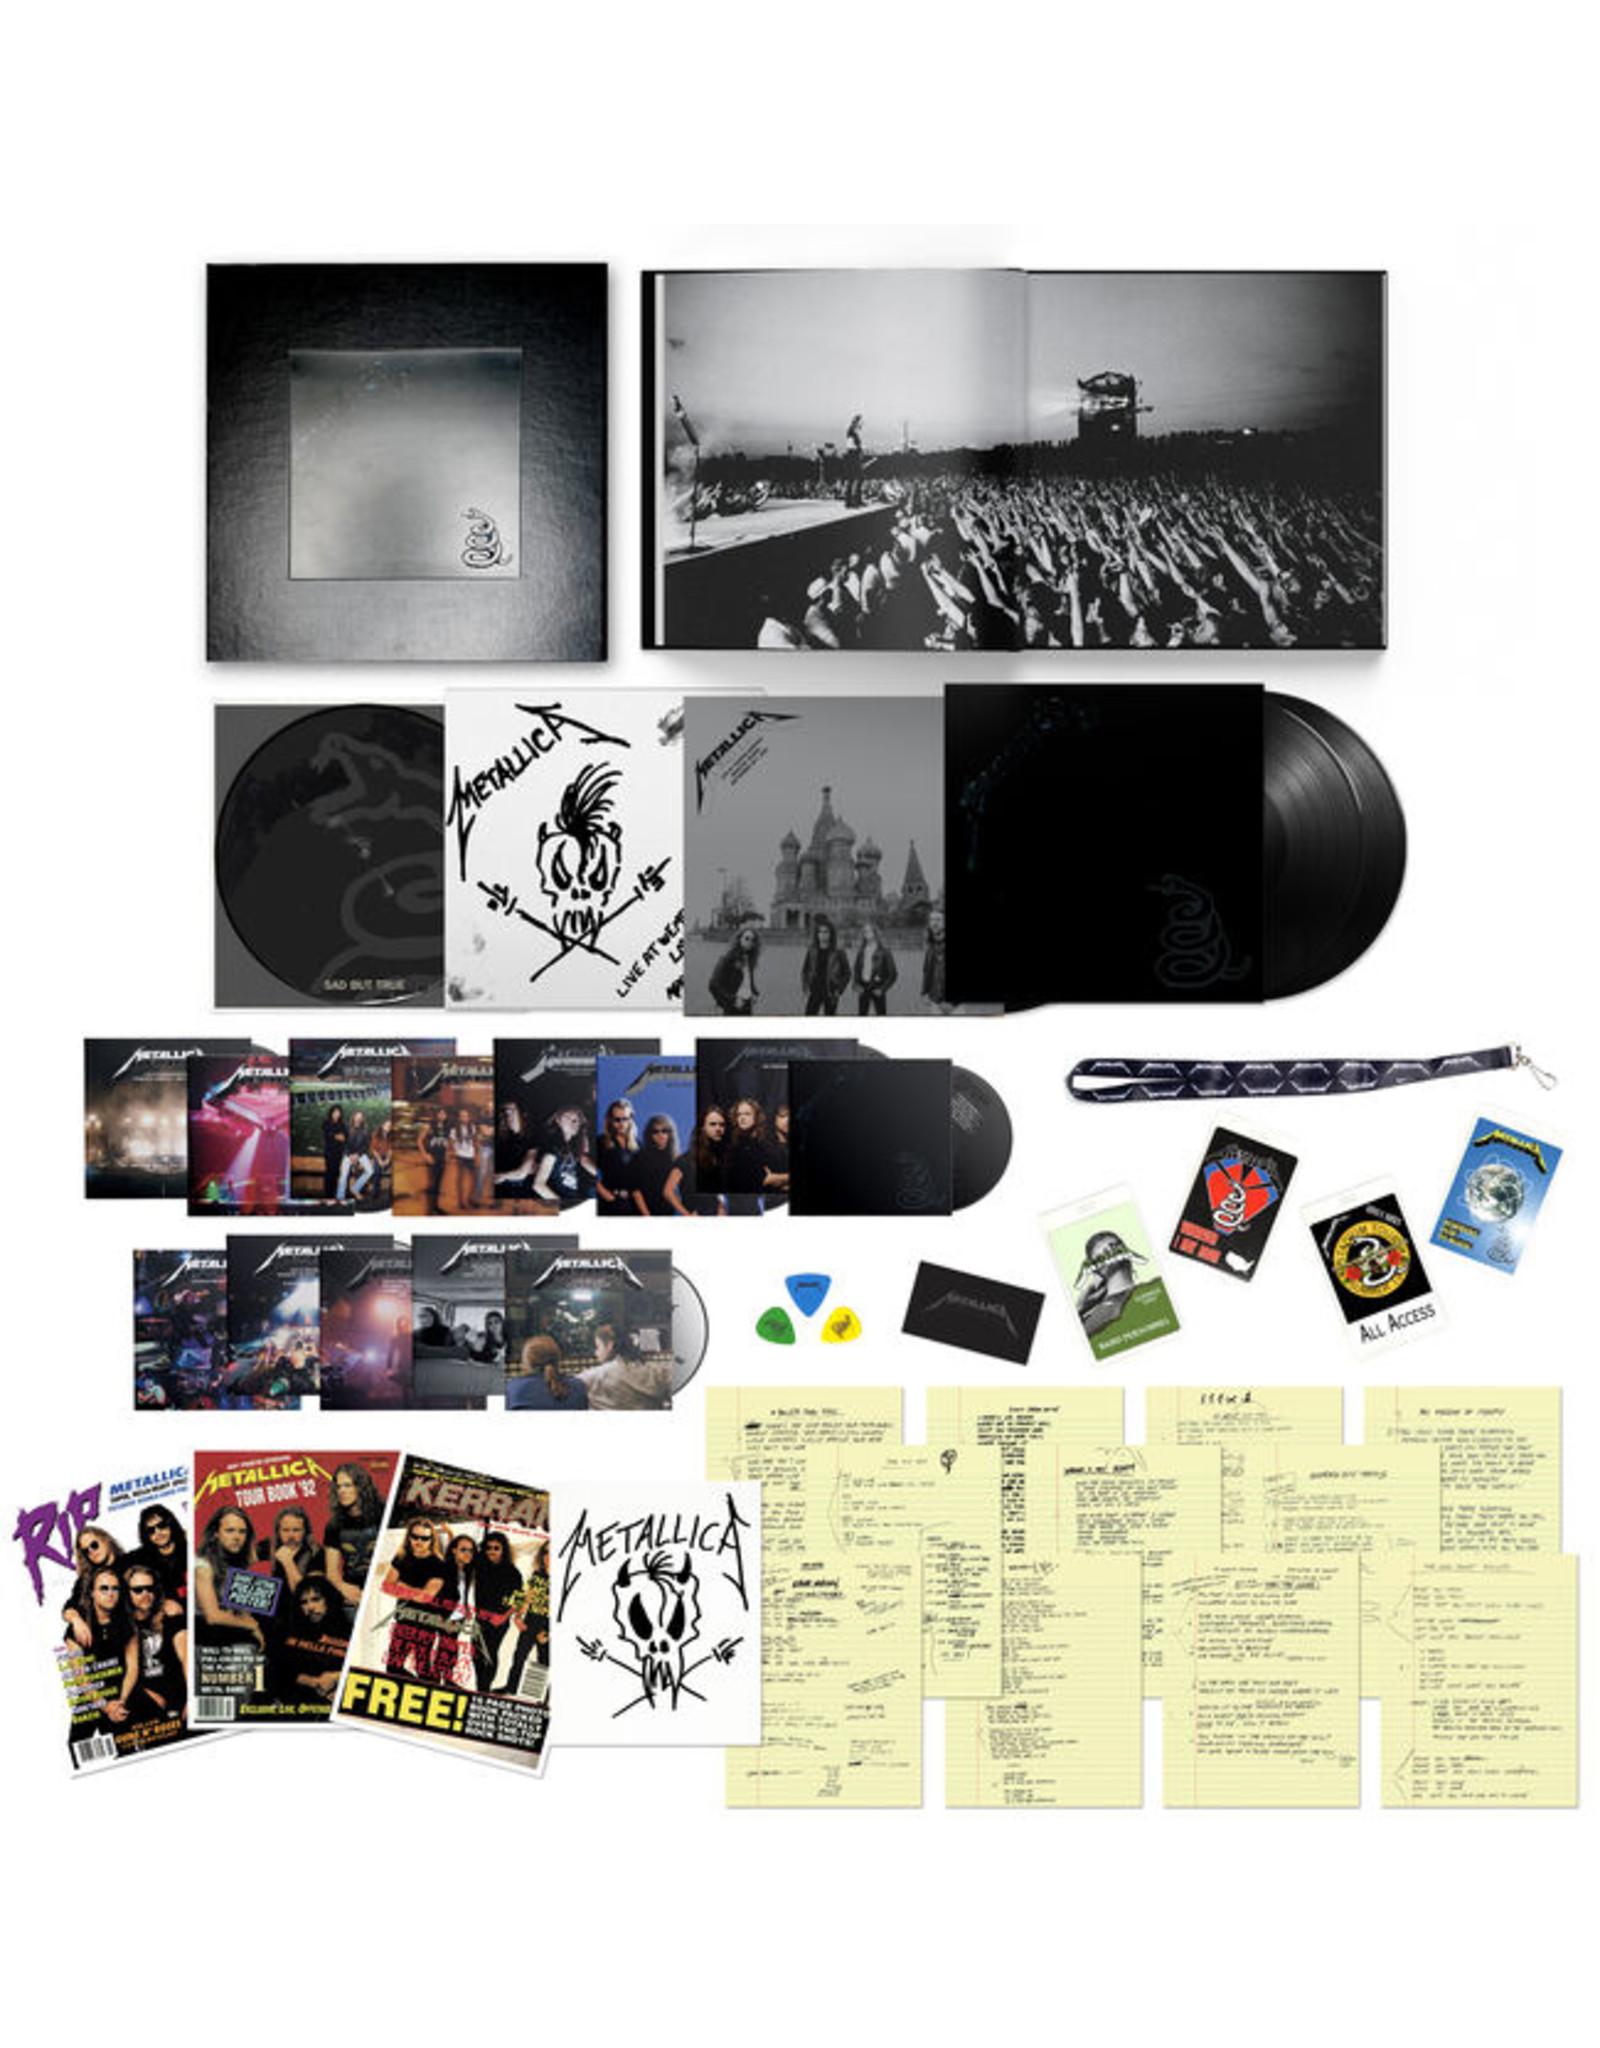 Metallica - Black Album (Remastered) (Limited Edition Deluxe Box Set)